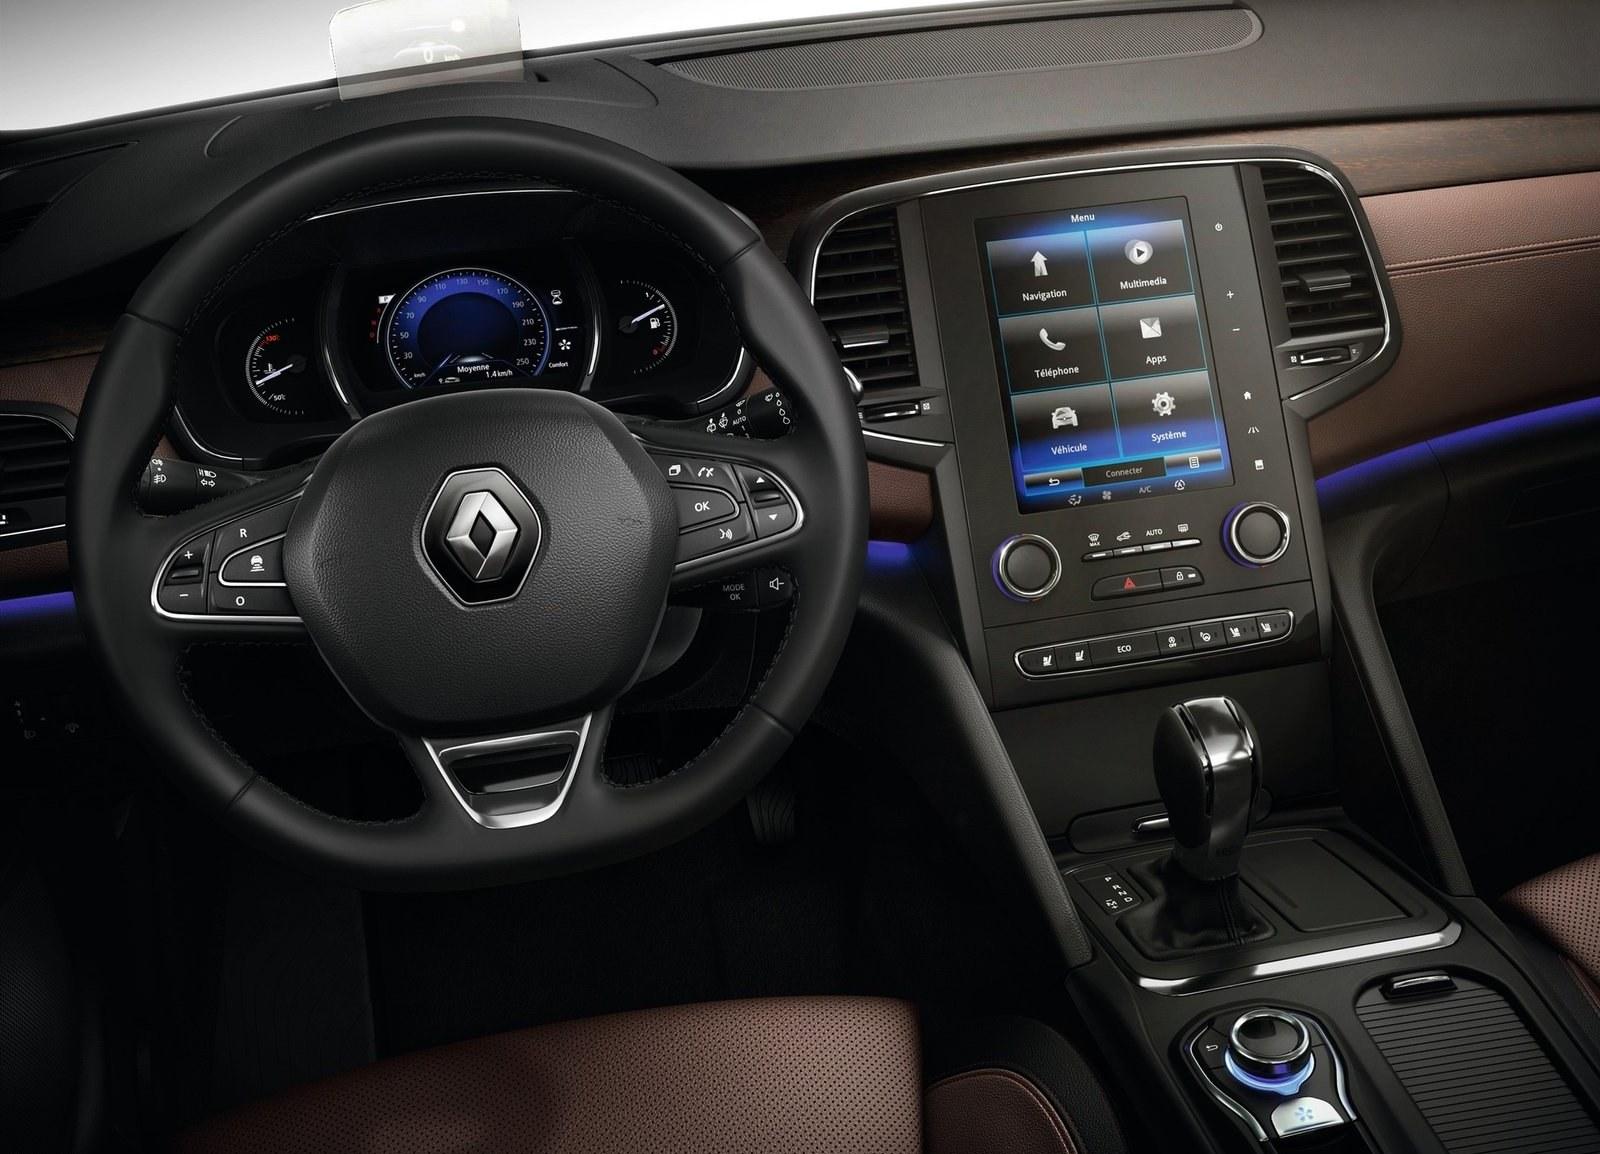 2016 Renault Talisman Cockpit and Dashboard